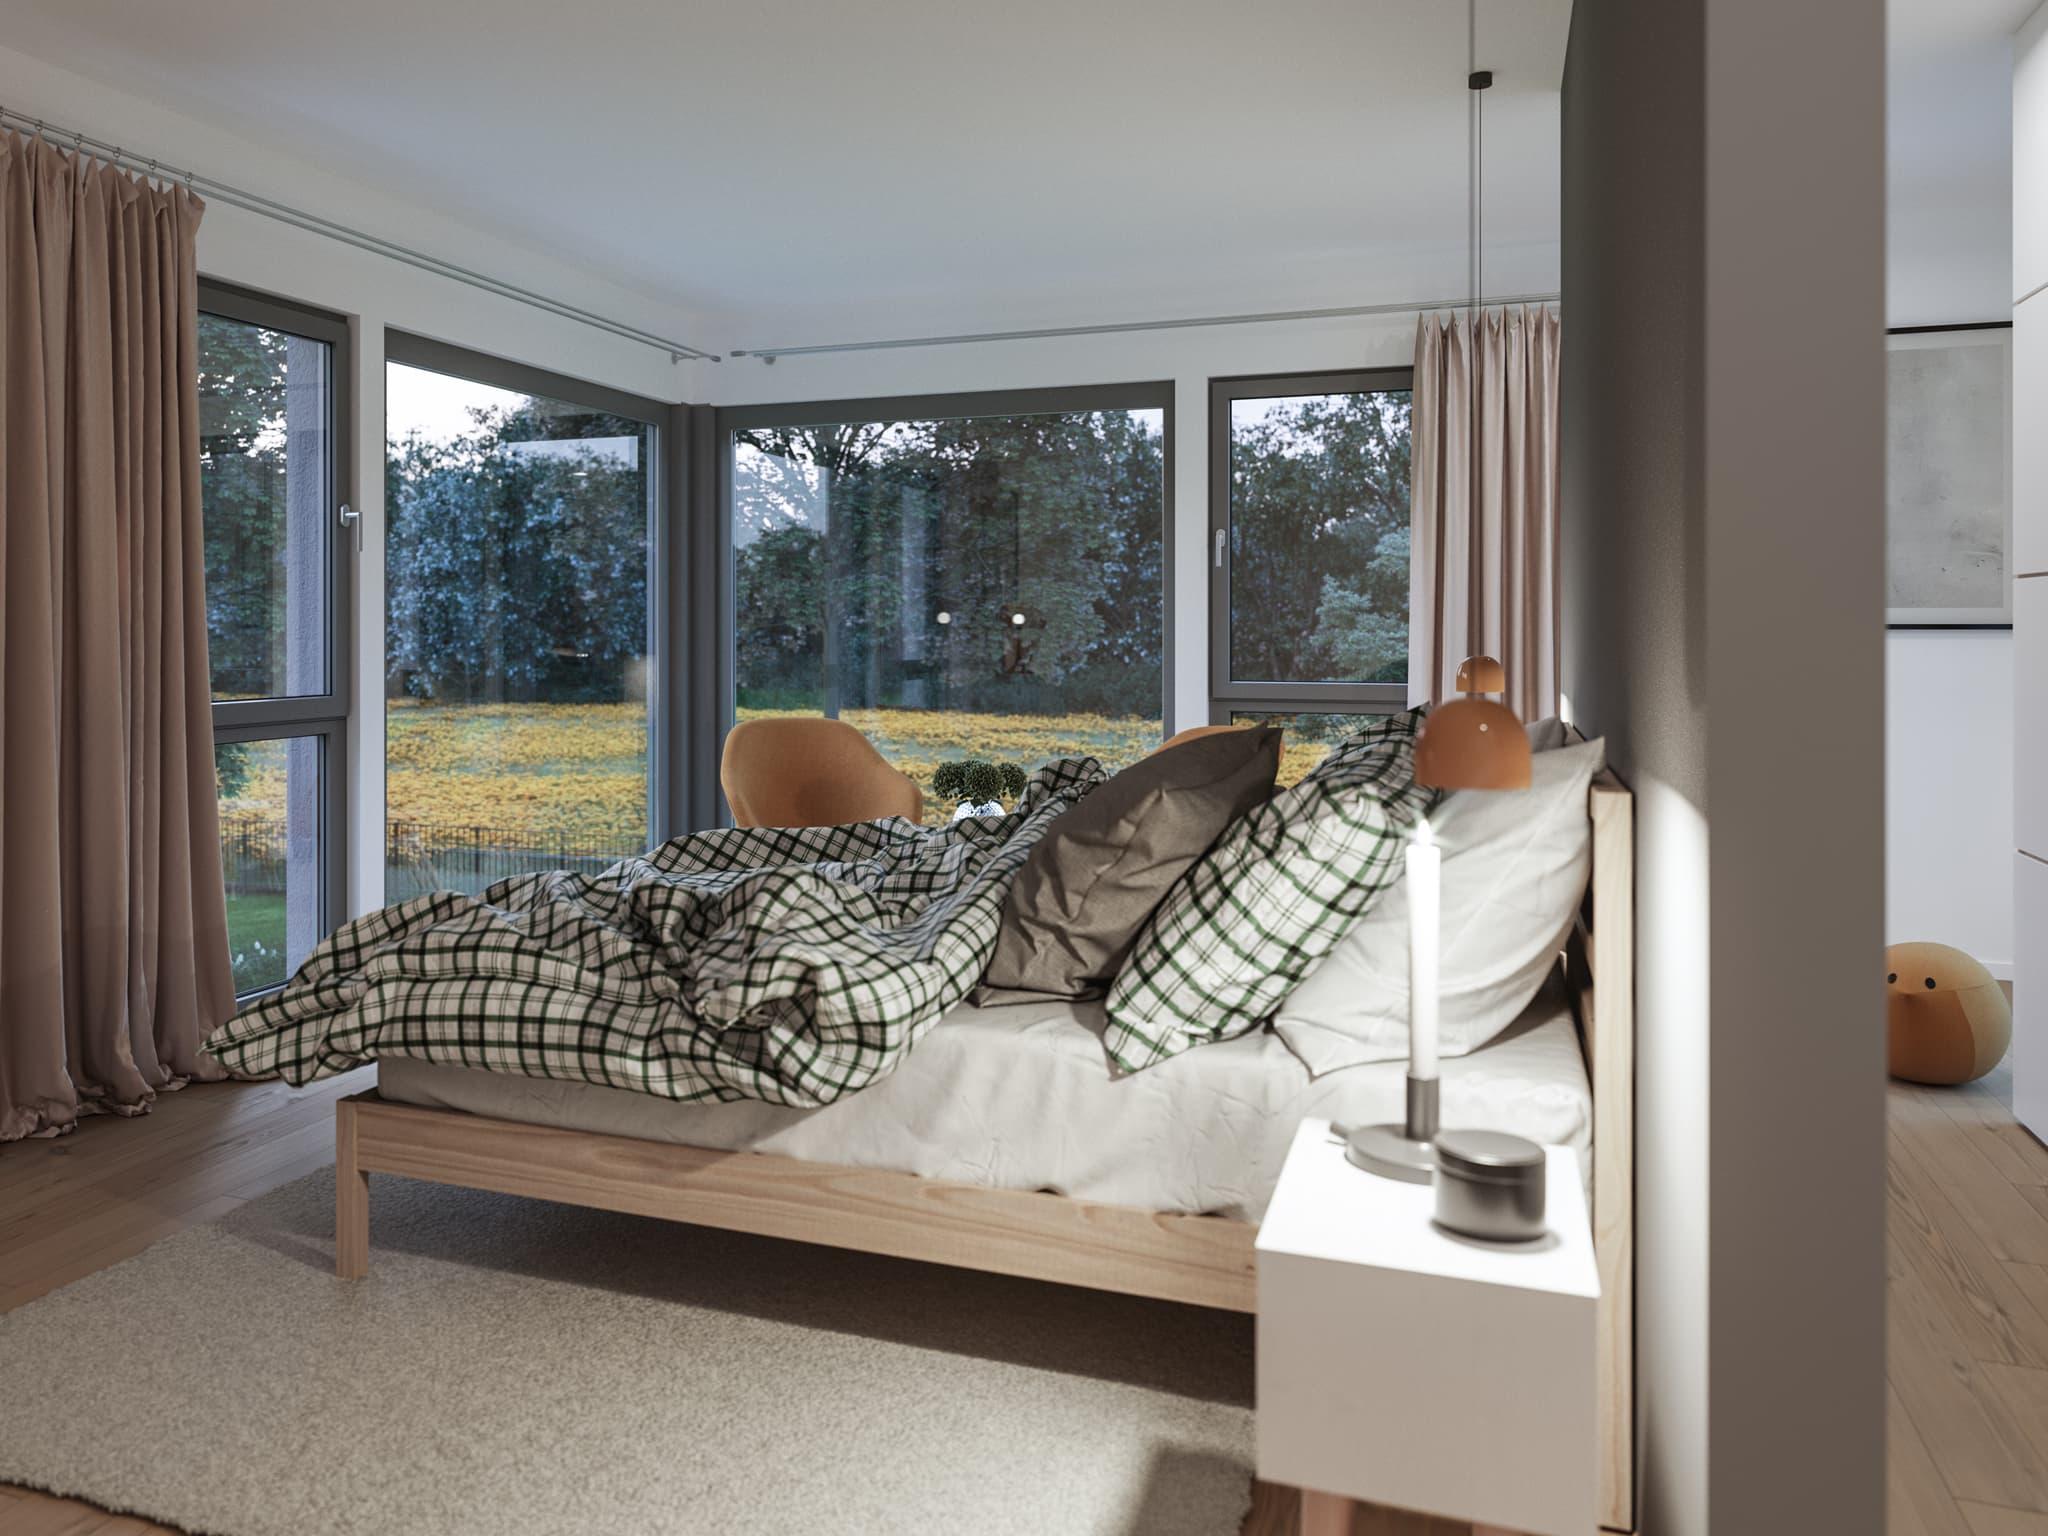 Schlafzimmer modern beige - Ideen Inneneinrichtung Fertighaus Living Haus SUNSHINE 154 V2 - HausbauDirekt.de